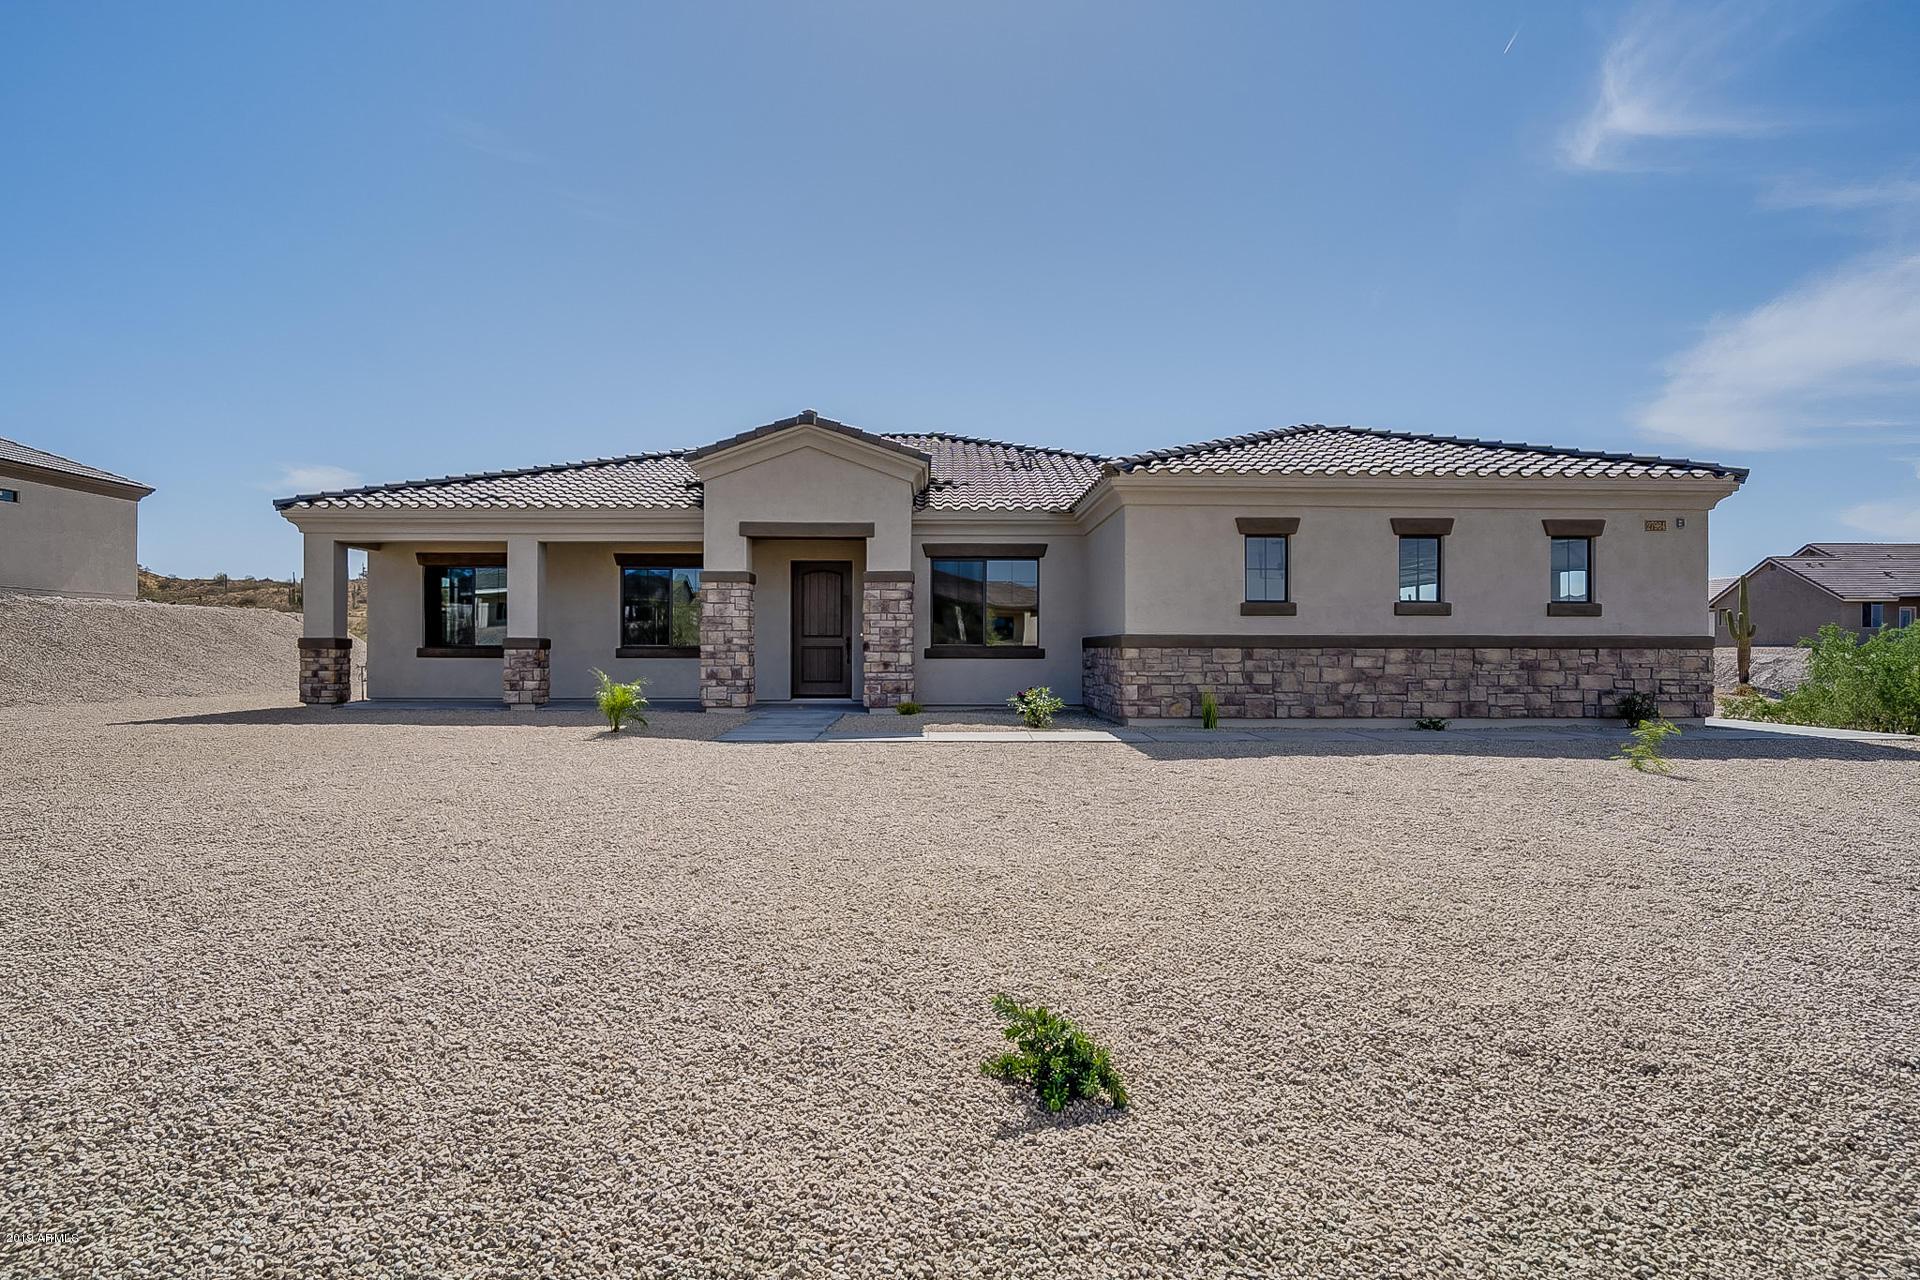 27964 N Cindy Lane, Queen Creek, AZ 85142